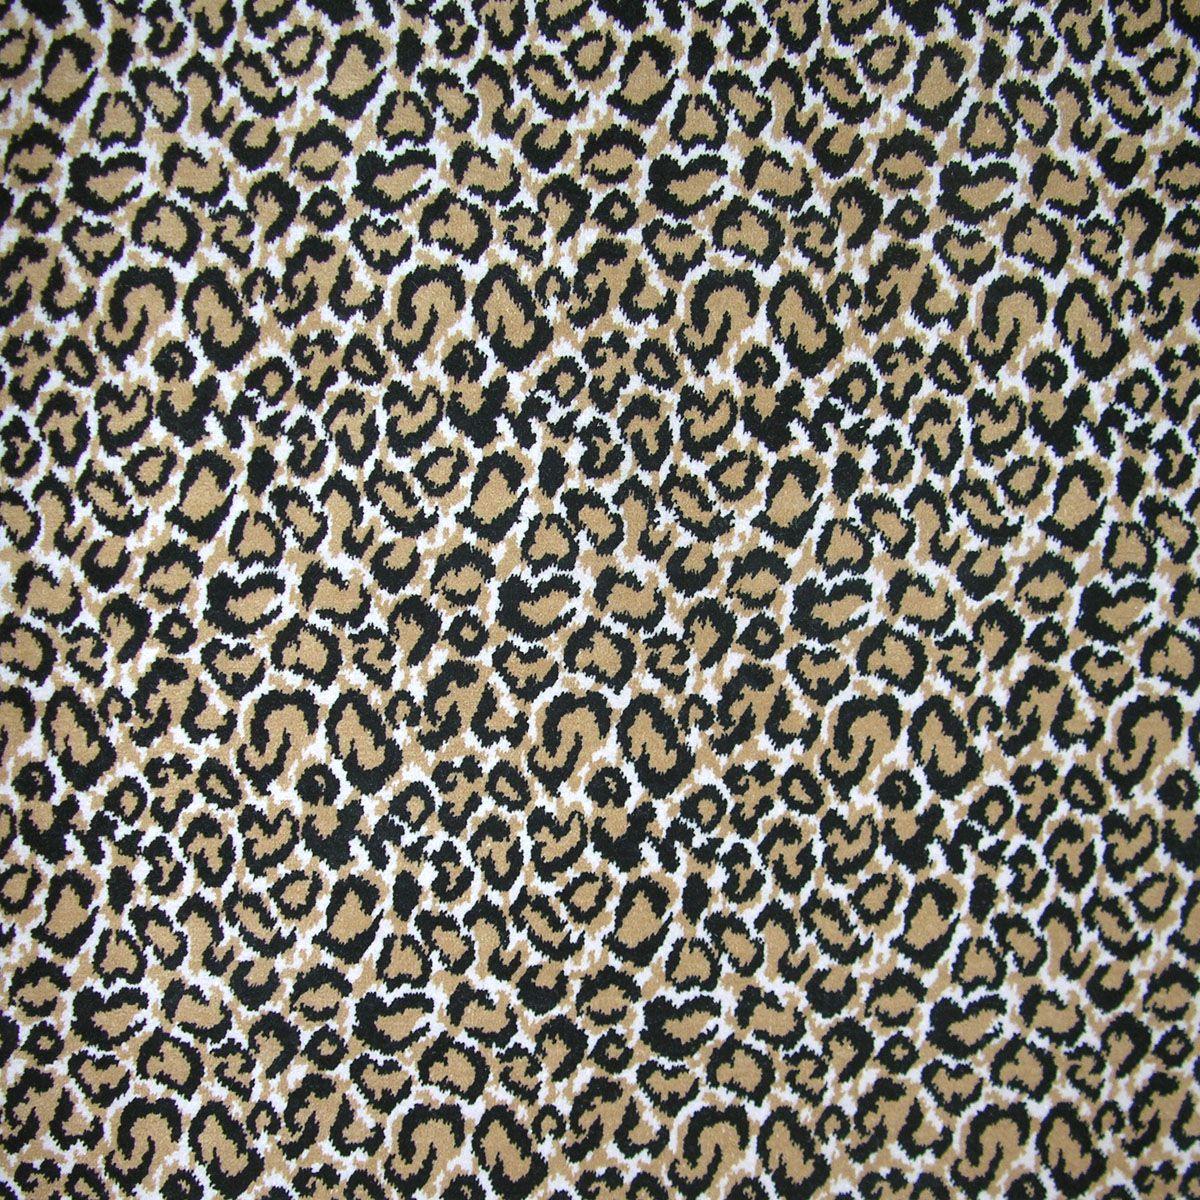 Stark Leopard Print Rug: Stark Carpet. Available